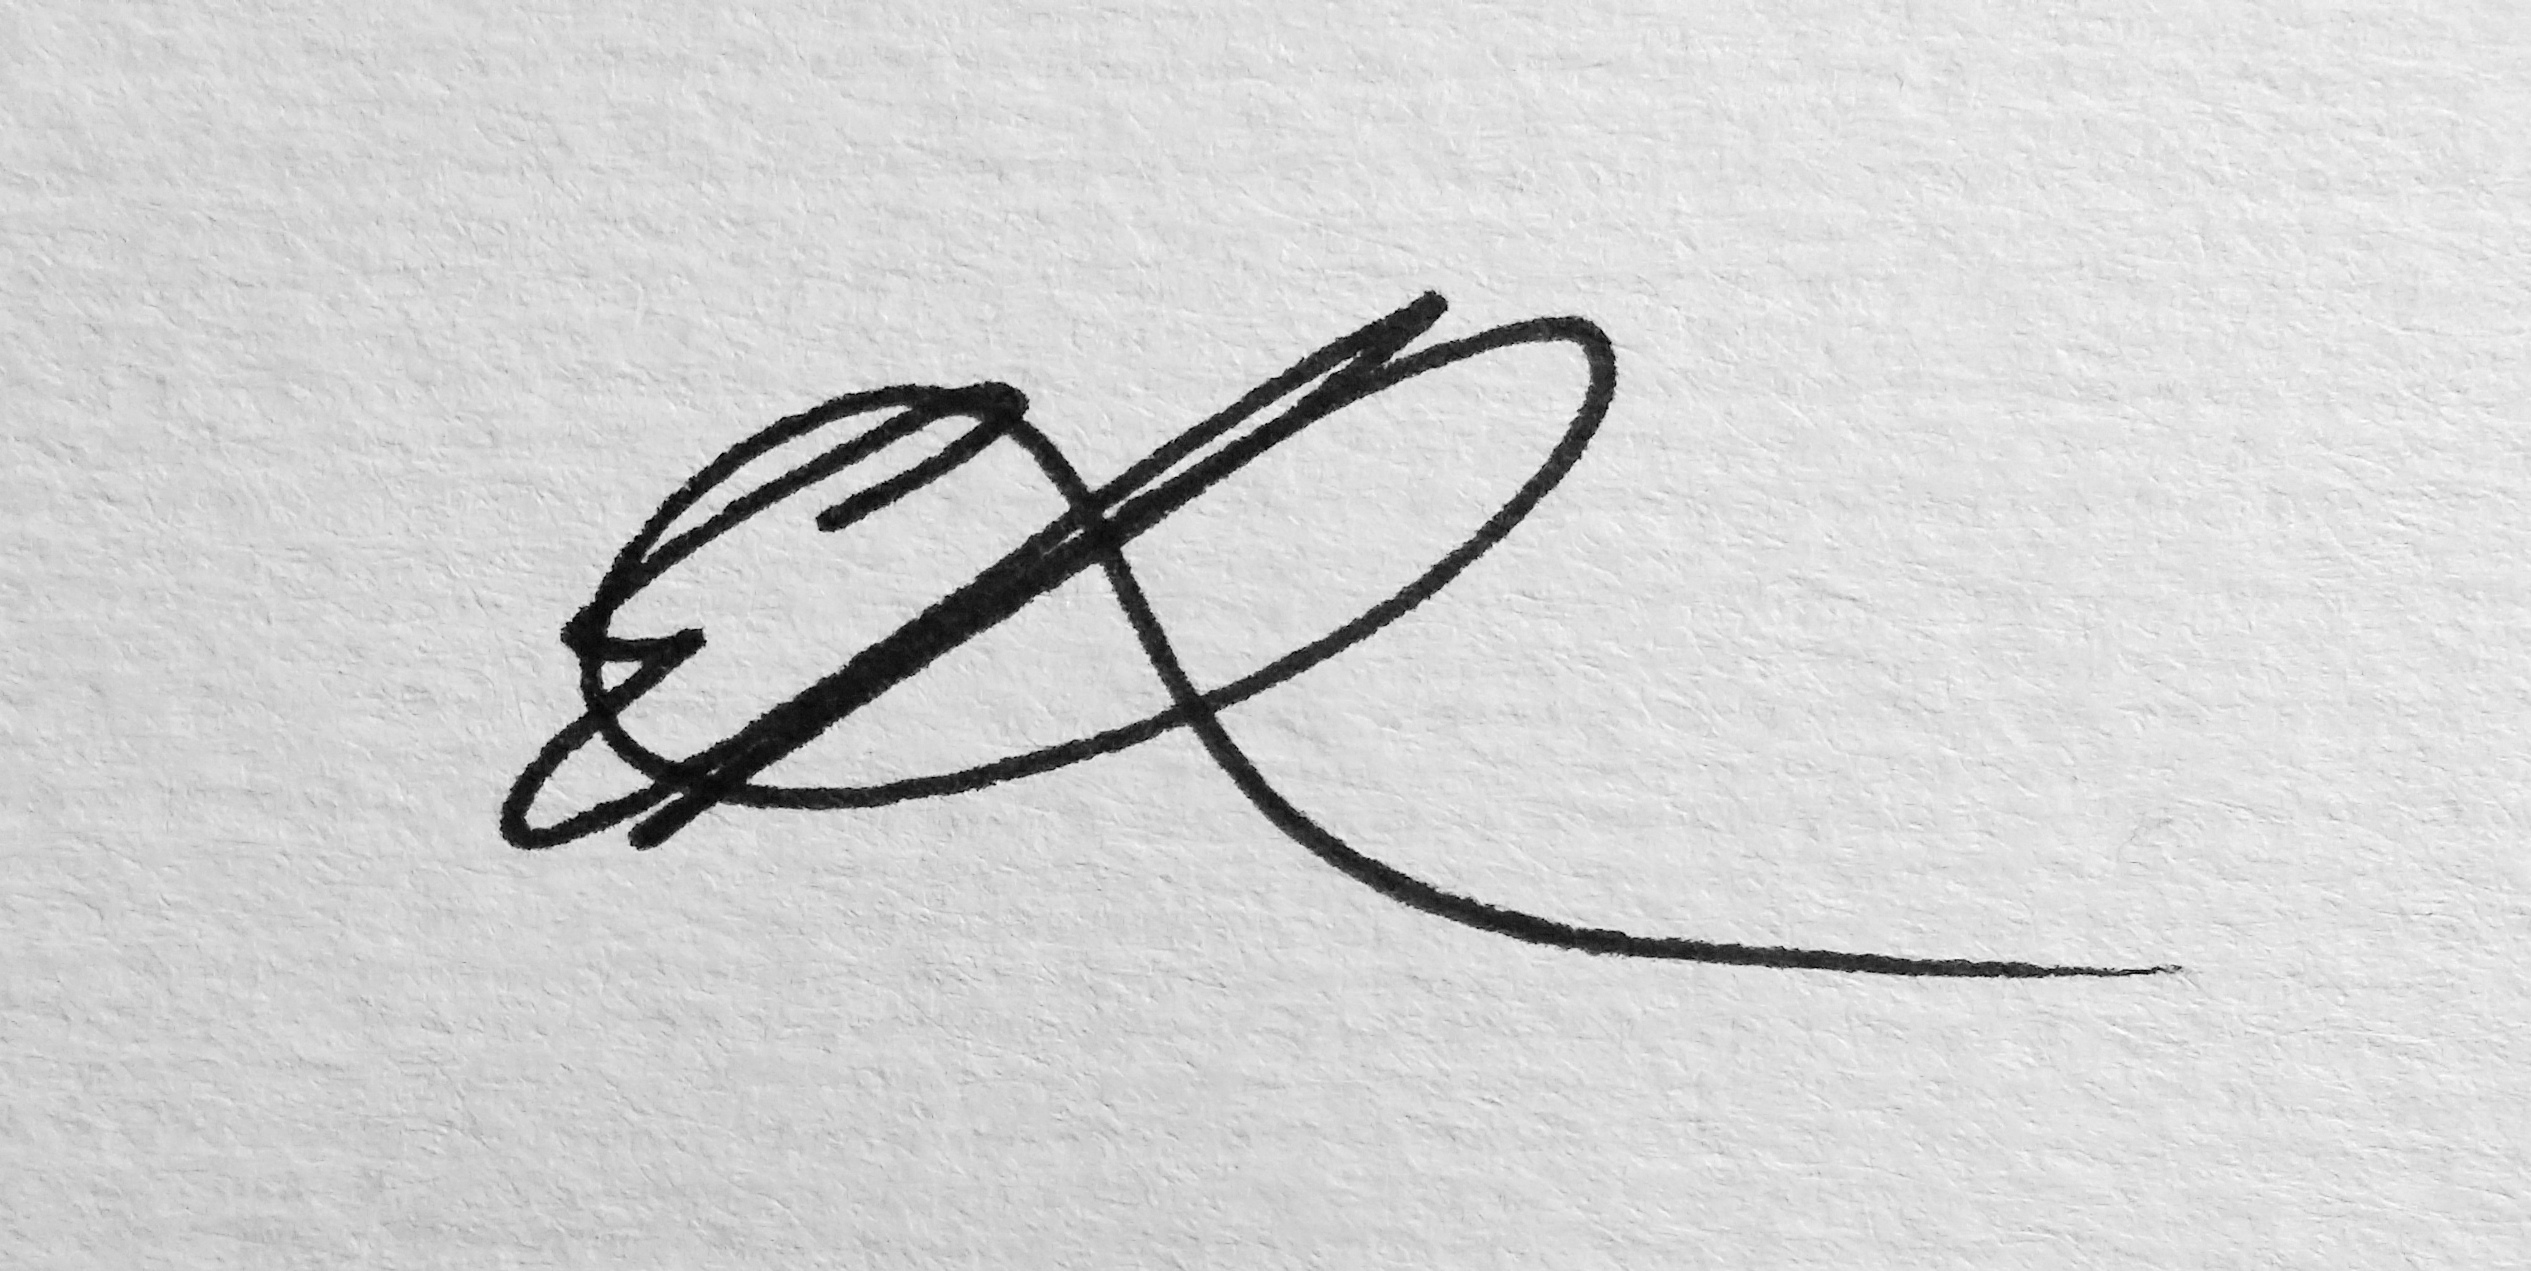 Emily Pitman's Signature